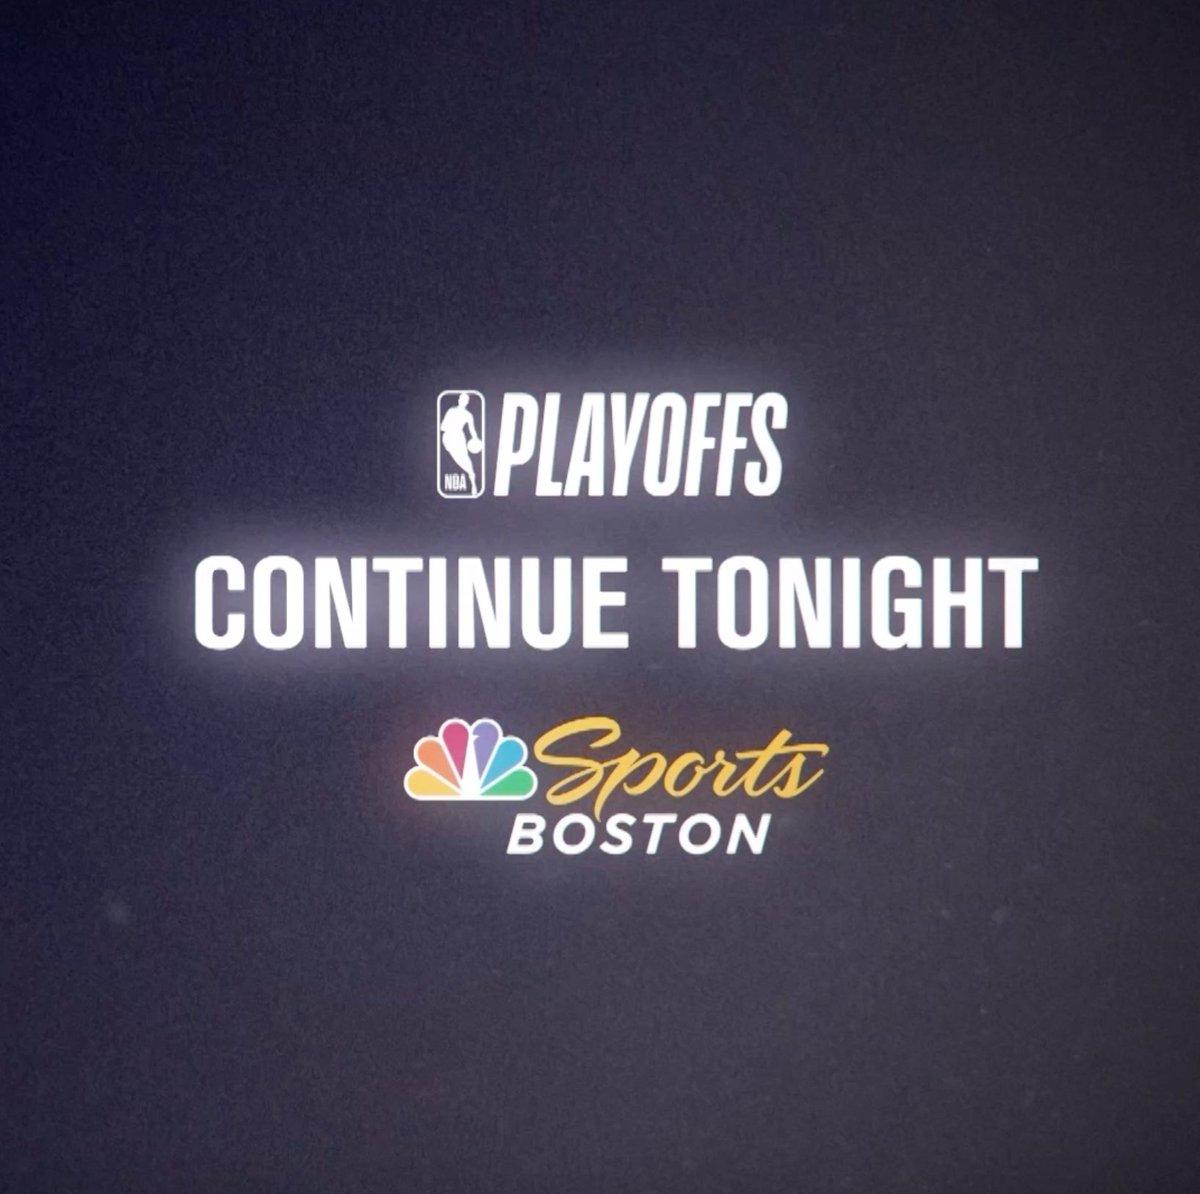 Celtics on NBC Sports Boston's photo on #NBAPlayoffs